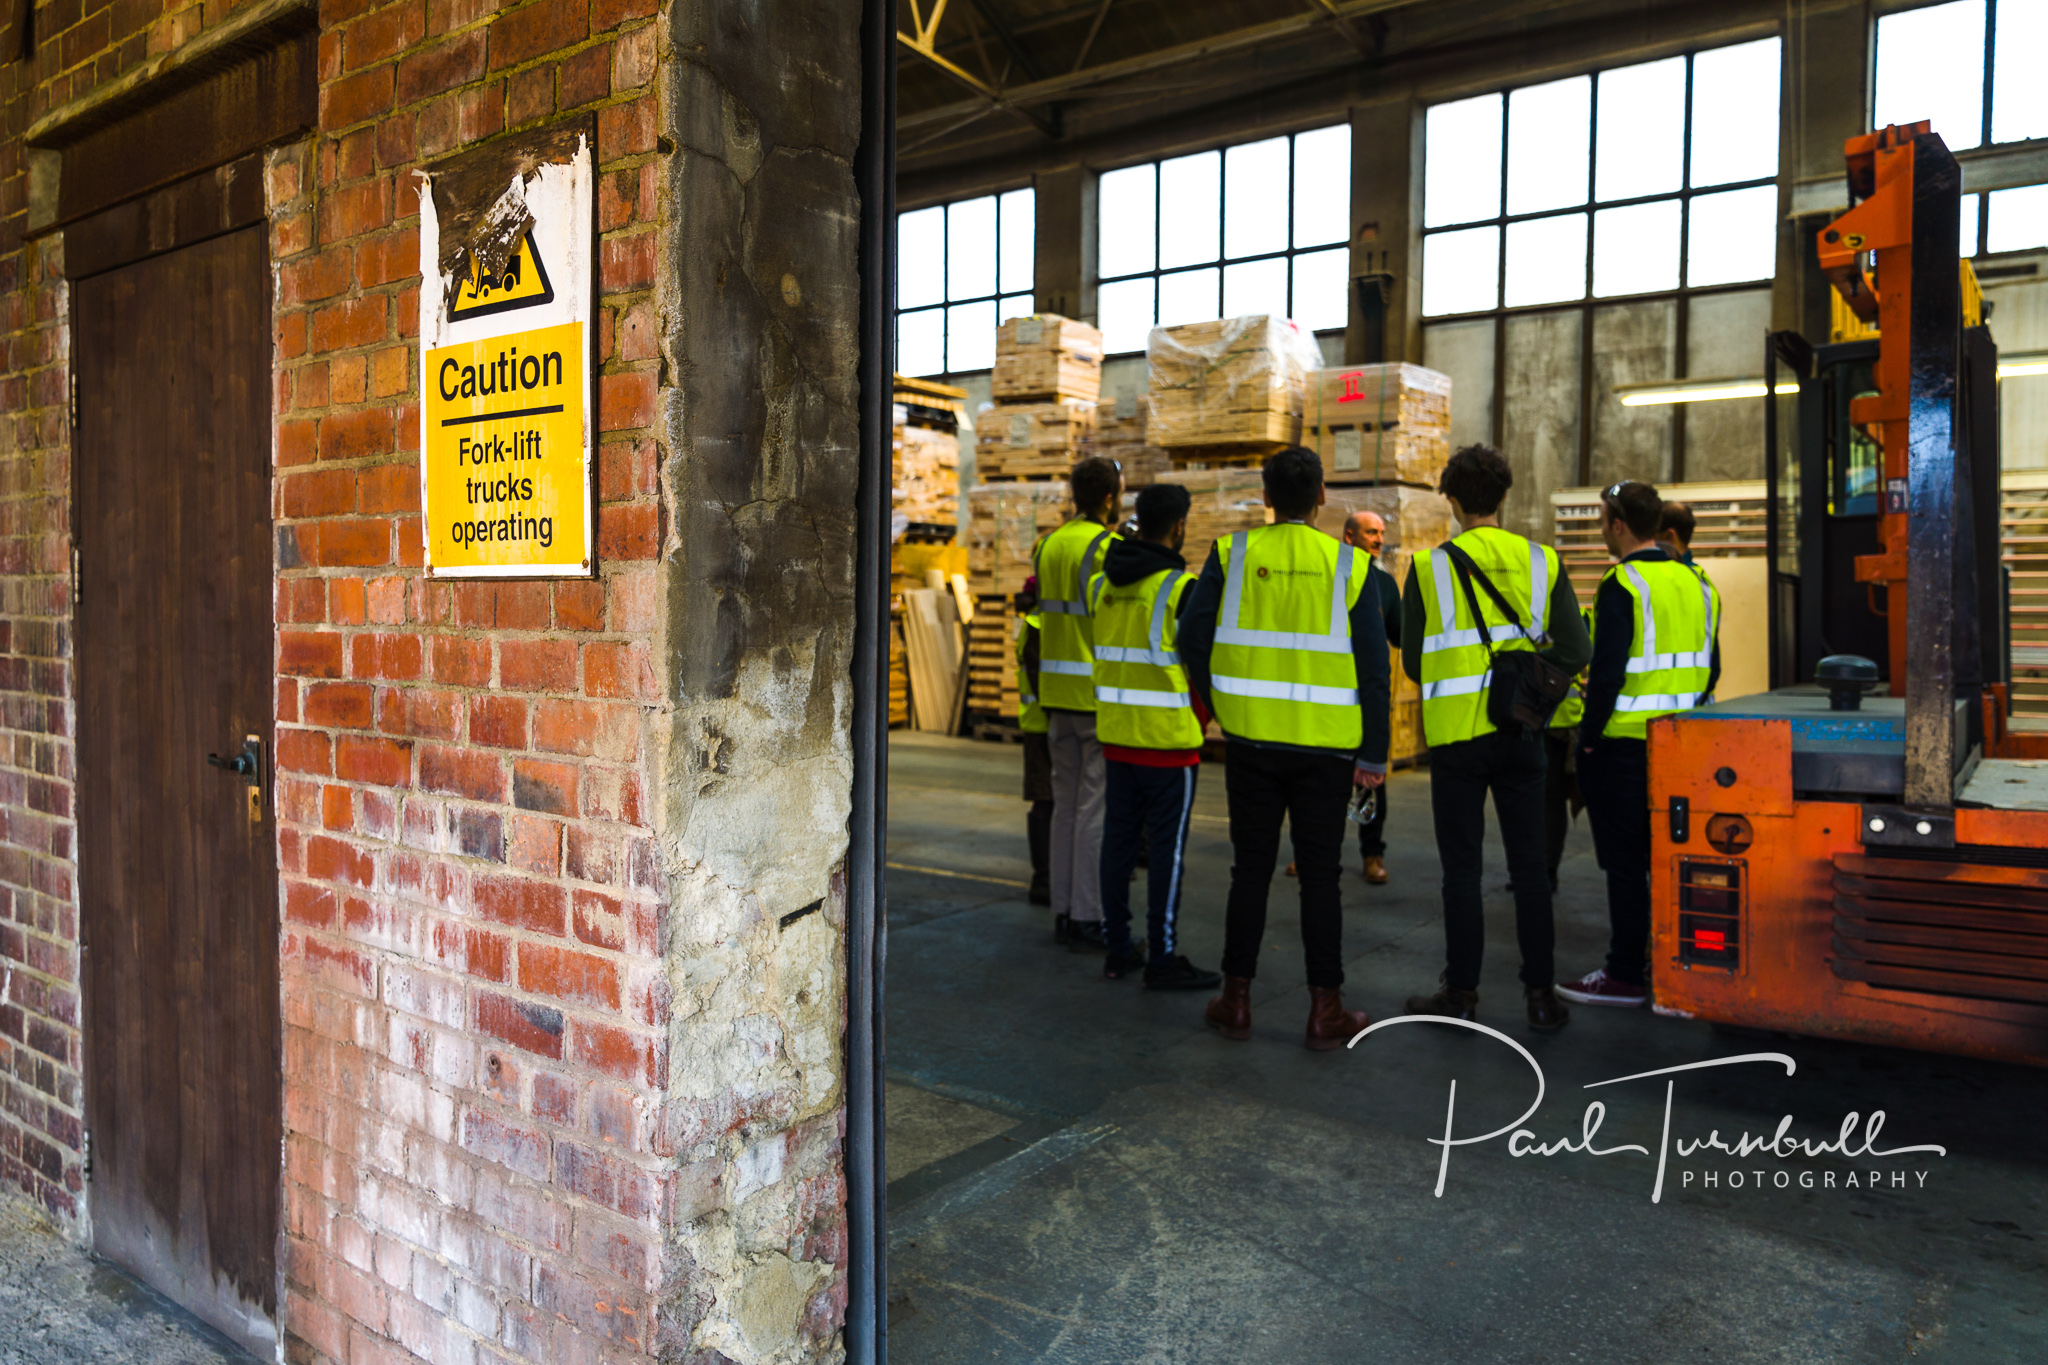 commercial-photographer-leeds-bradford-knightsbridge-furniture-tour-003.jpg